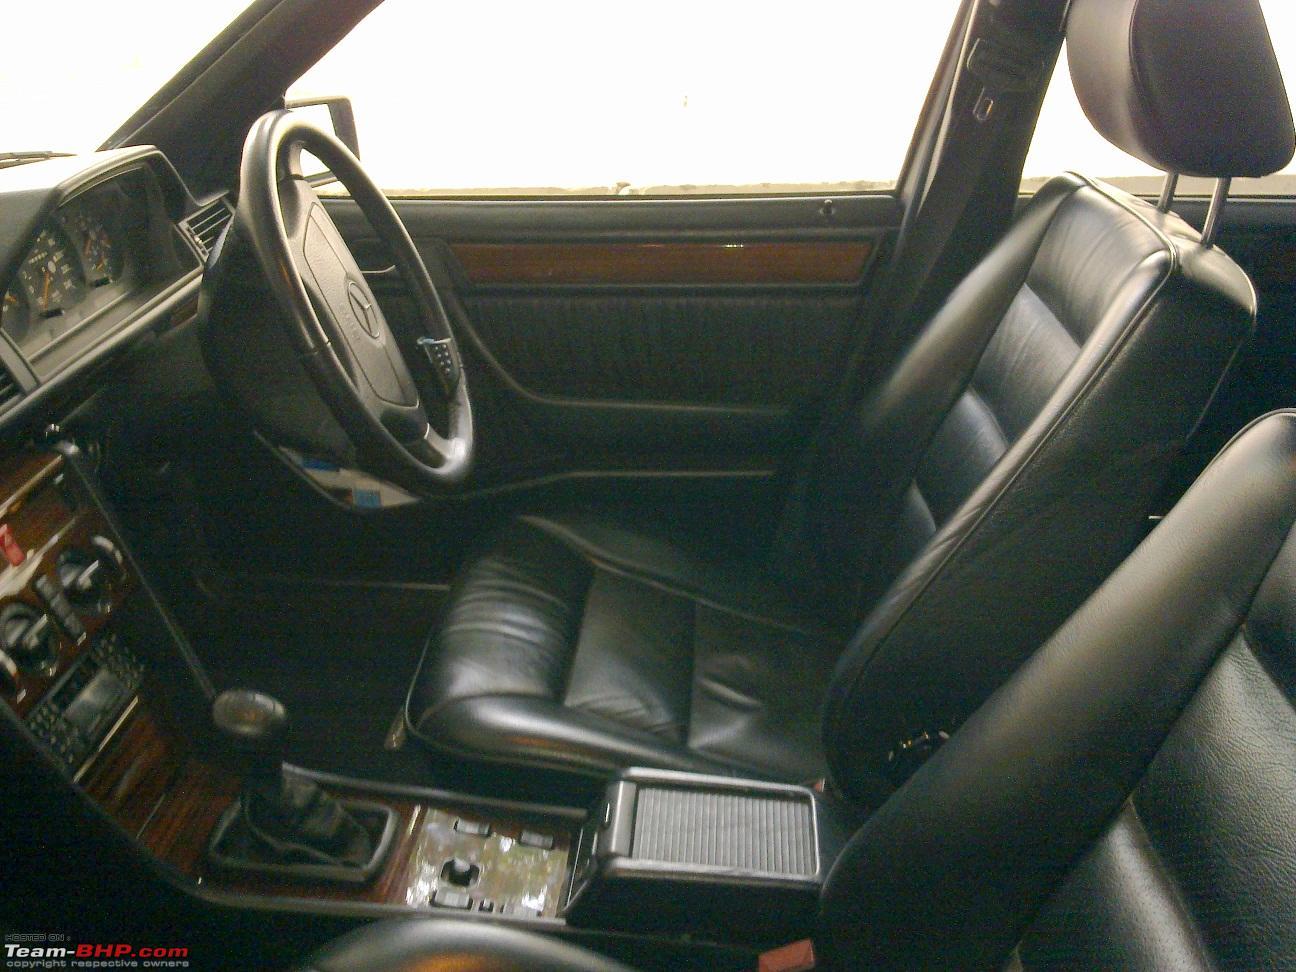 mercedes w124 interior parts. Black Bedroom Furniture Sets. Home Design Ideas